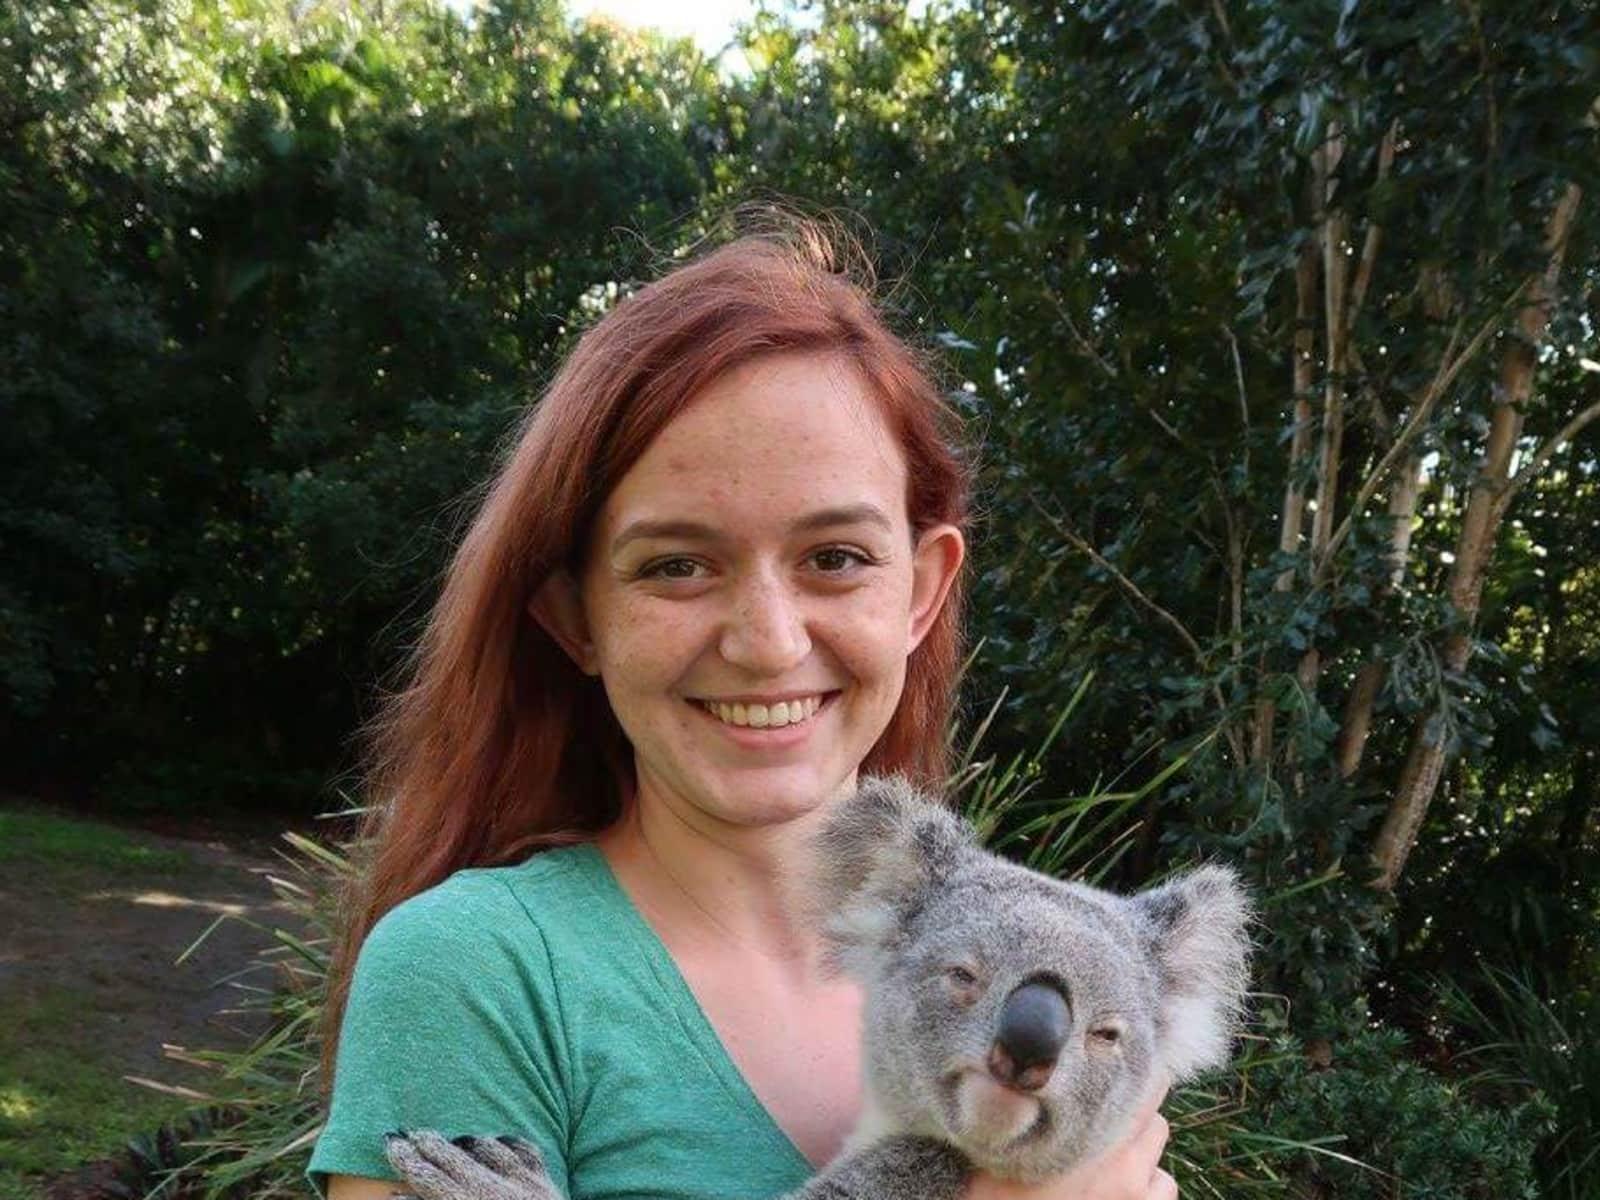 Olivia from Melbourne, Victoria, Australia